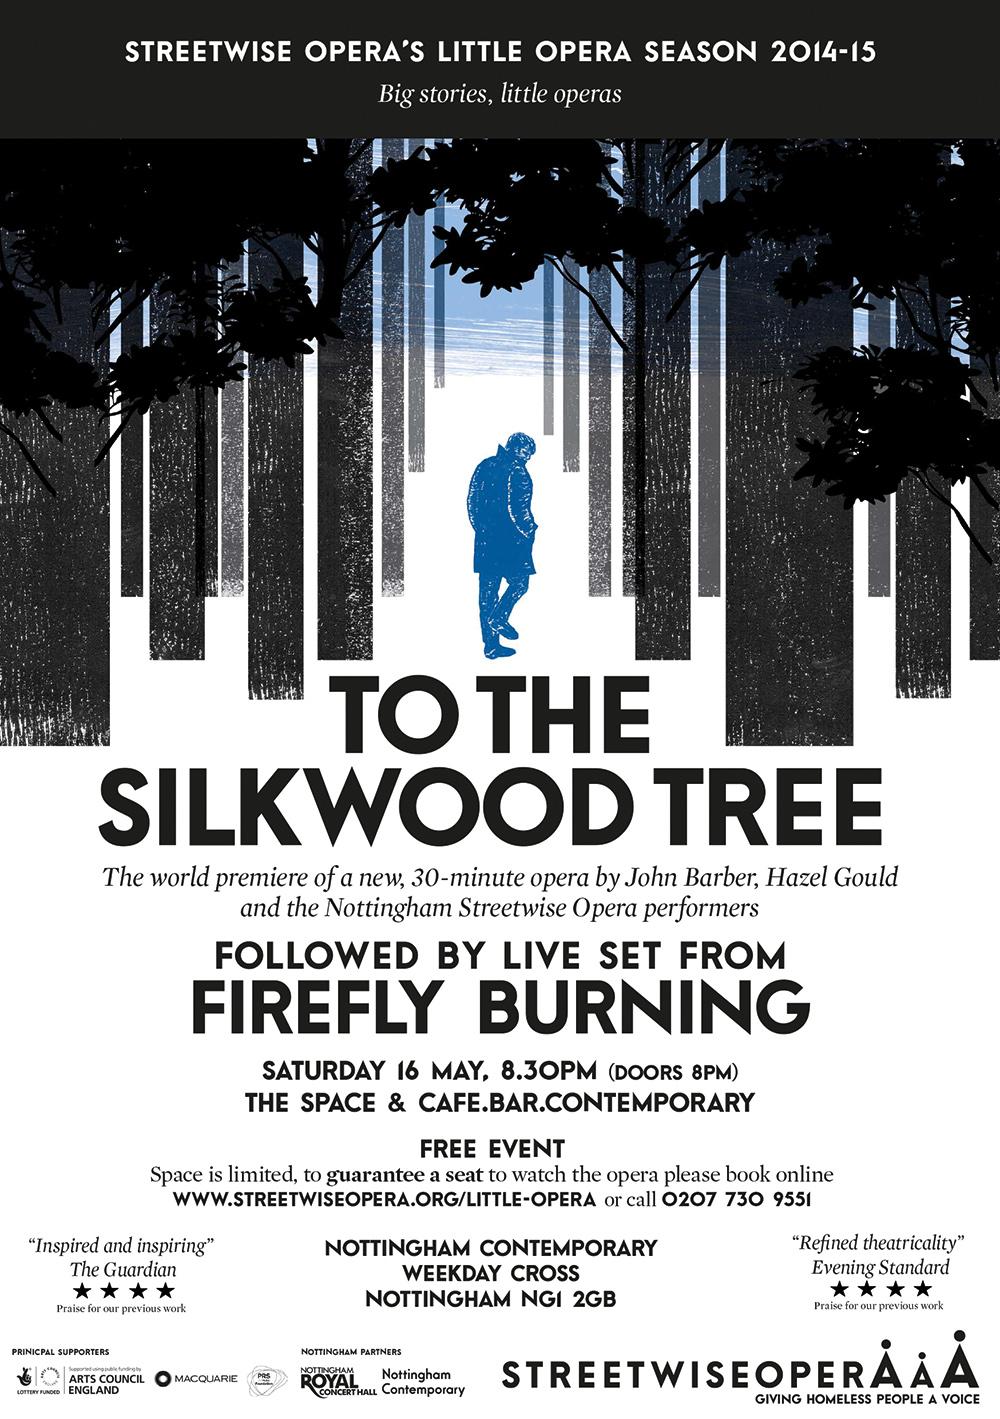 To The Silkwood Tree